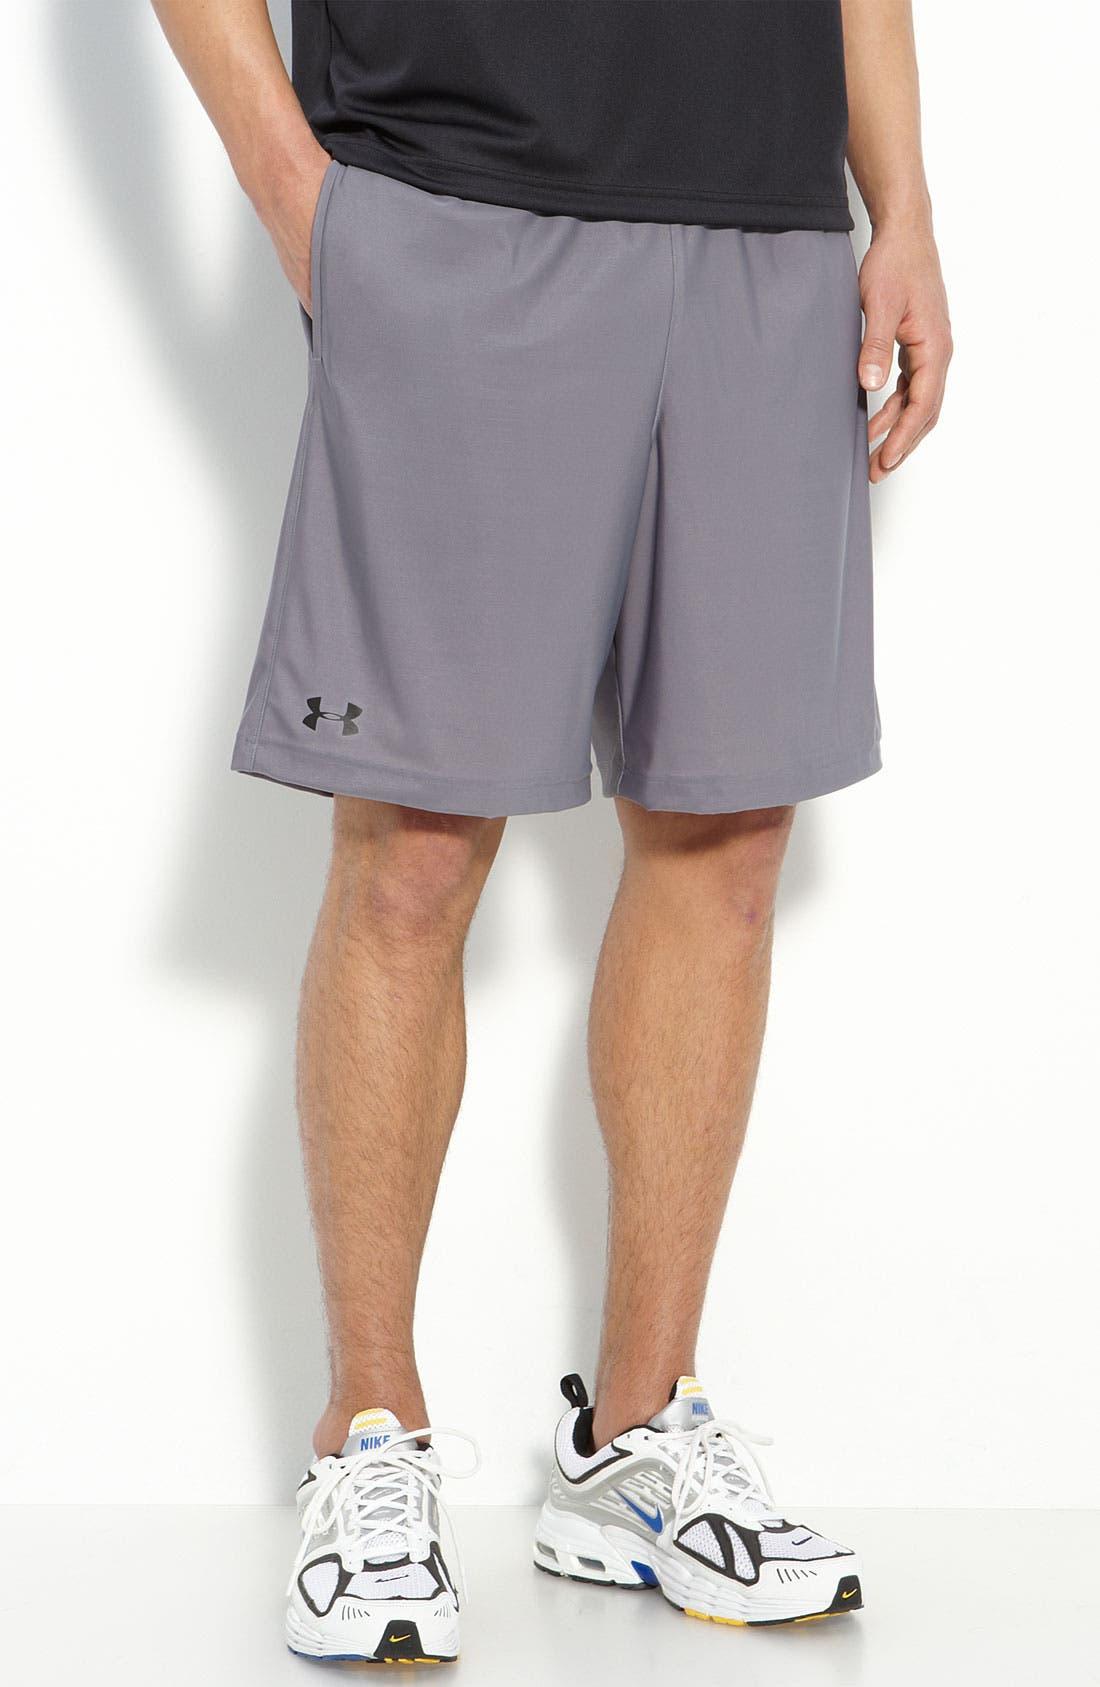 Main Image - Under Armour 'Micro' HeatGear® Knit Shorts